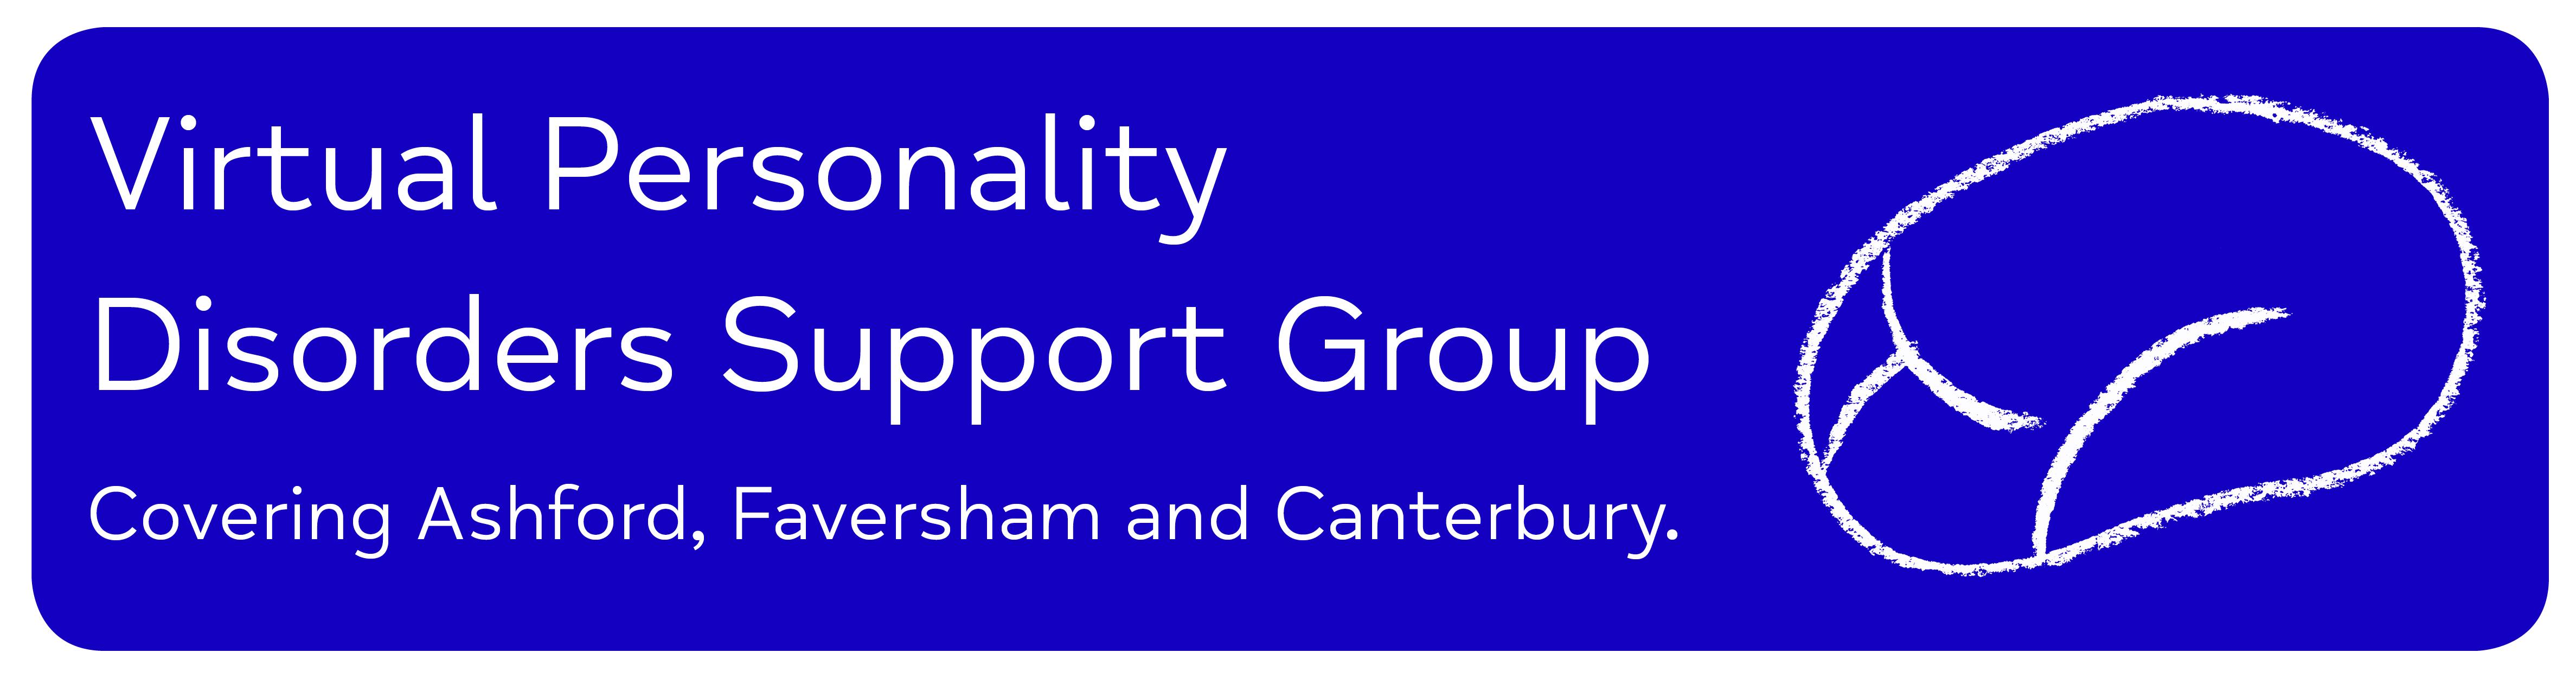 Virtual Personality Disorders Support Group Covering Ashford, Faversham and Canterbury..